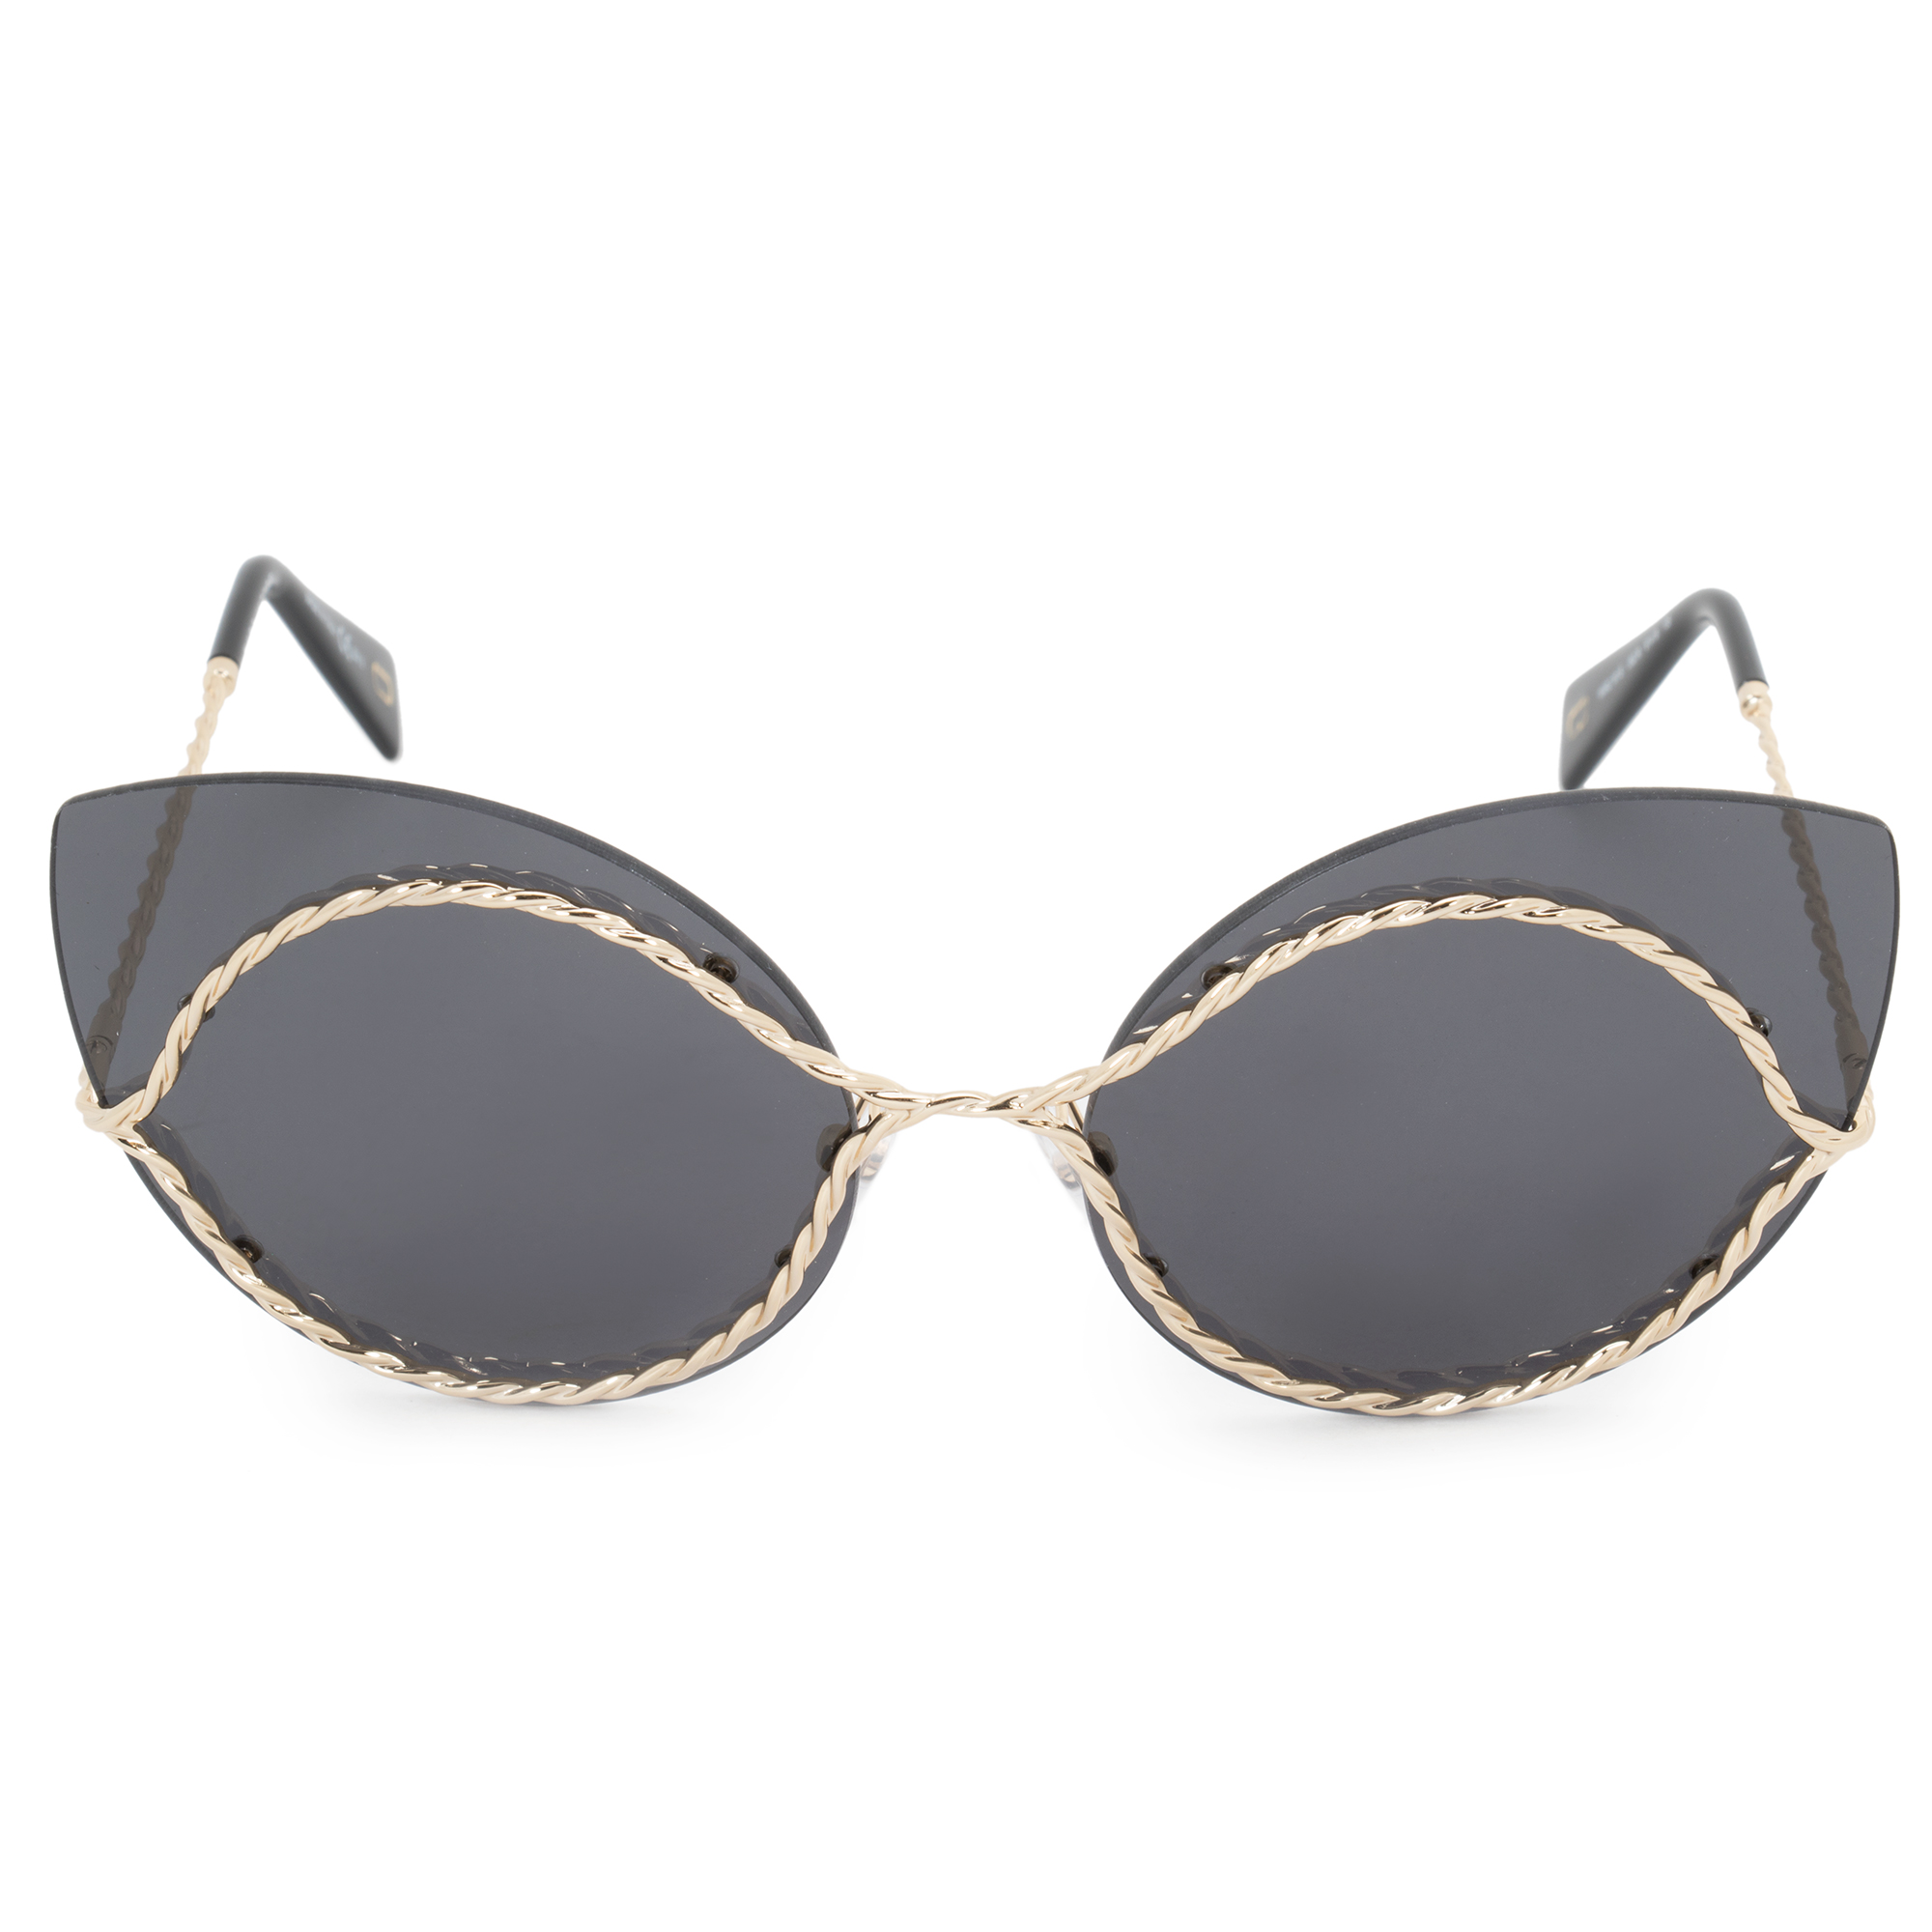 21d1fdbe777 Marc Jacobs Cat Eye Sunglasses MJ161S J5G IR 61 762753759207